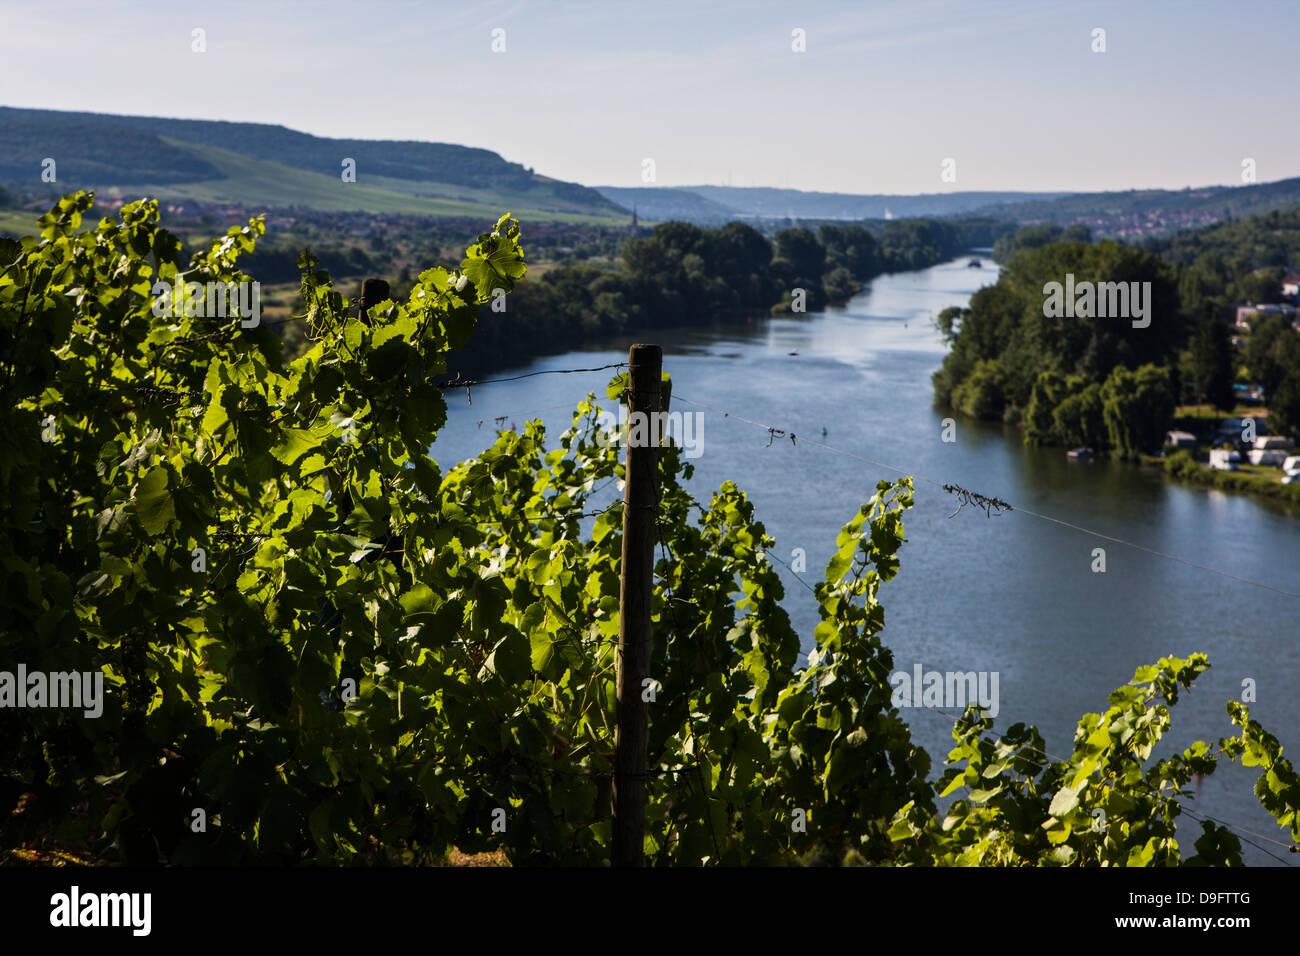 Vines above the Main valley, Franconia, Bavaria, Germany - Stock Image